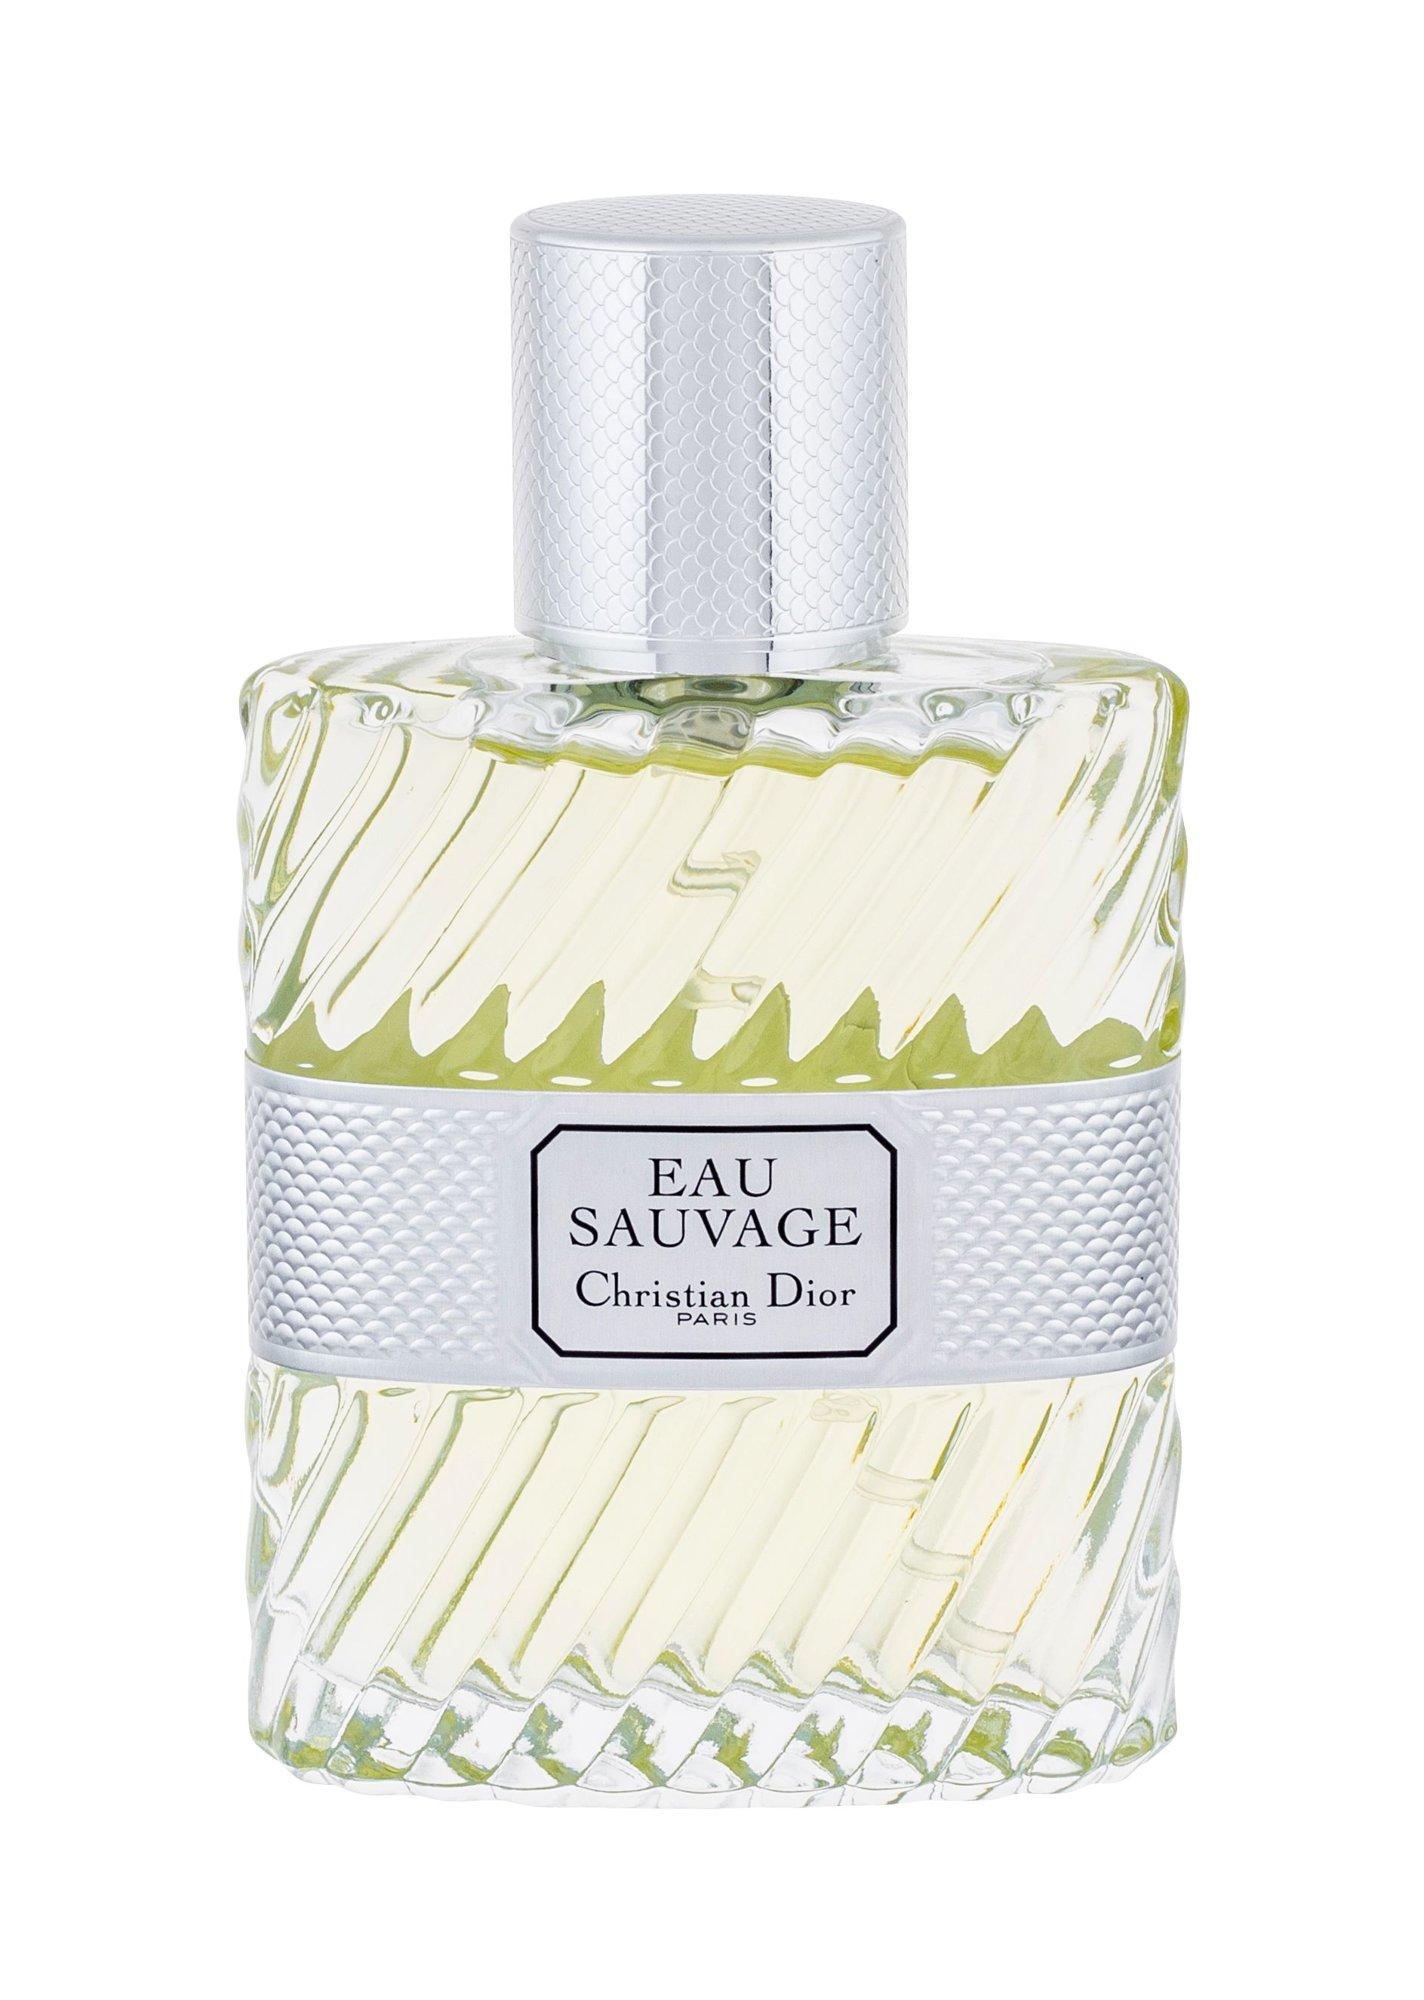 Christian Dior Eau Sauvage EDT 50ml